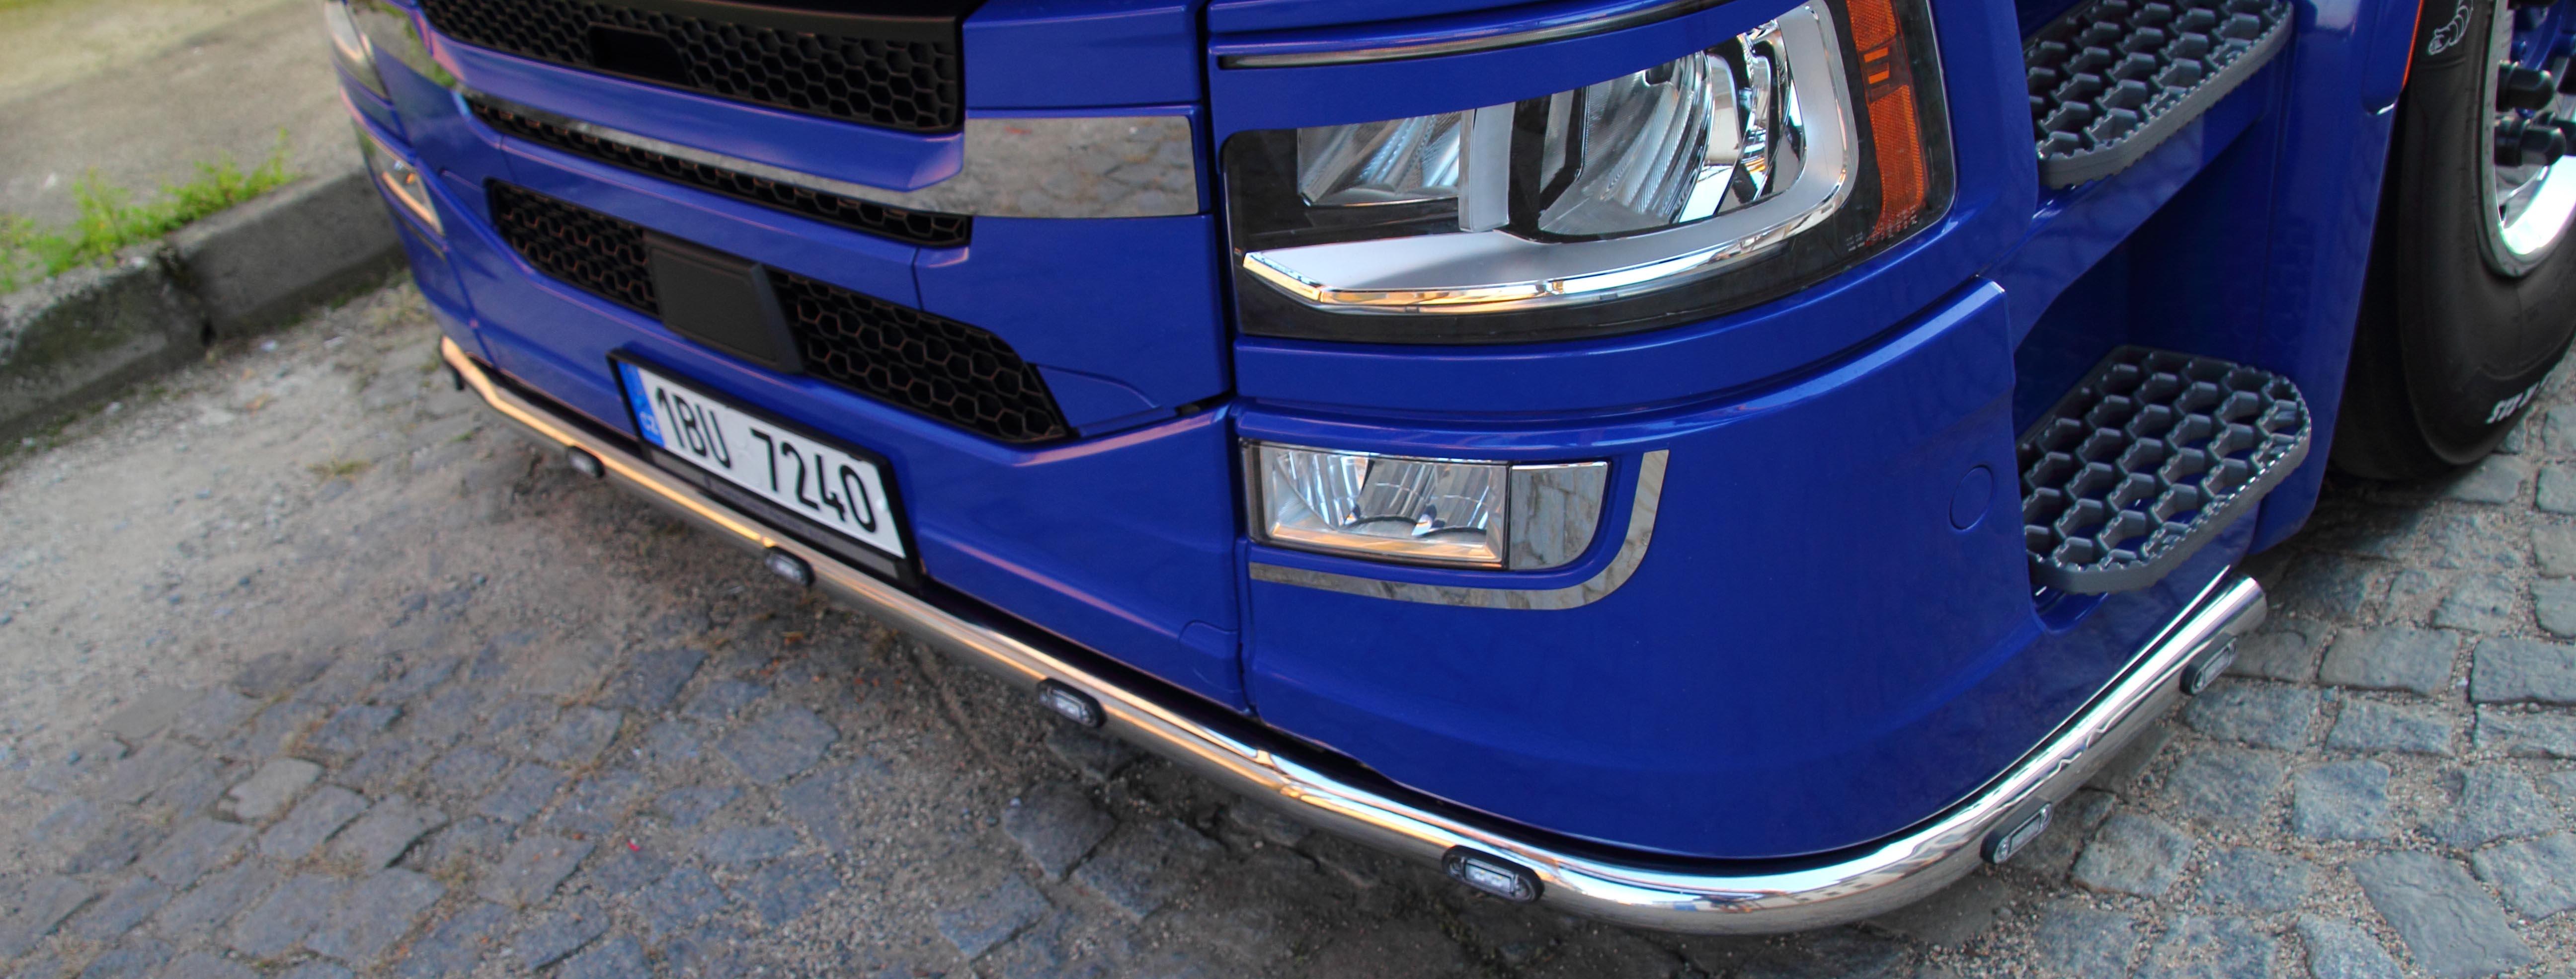 Scania S series